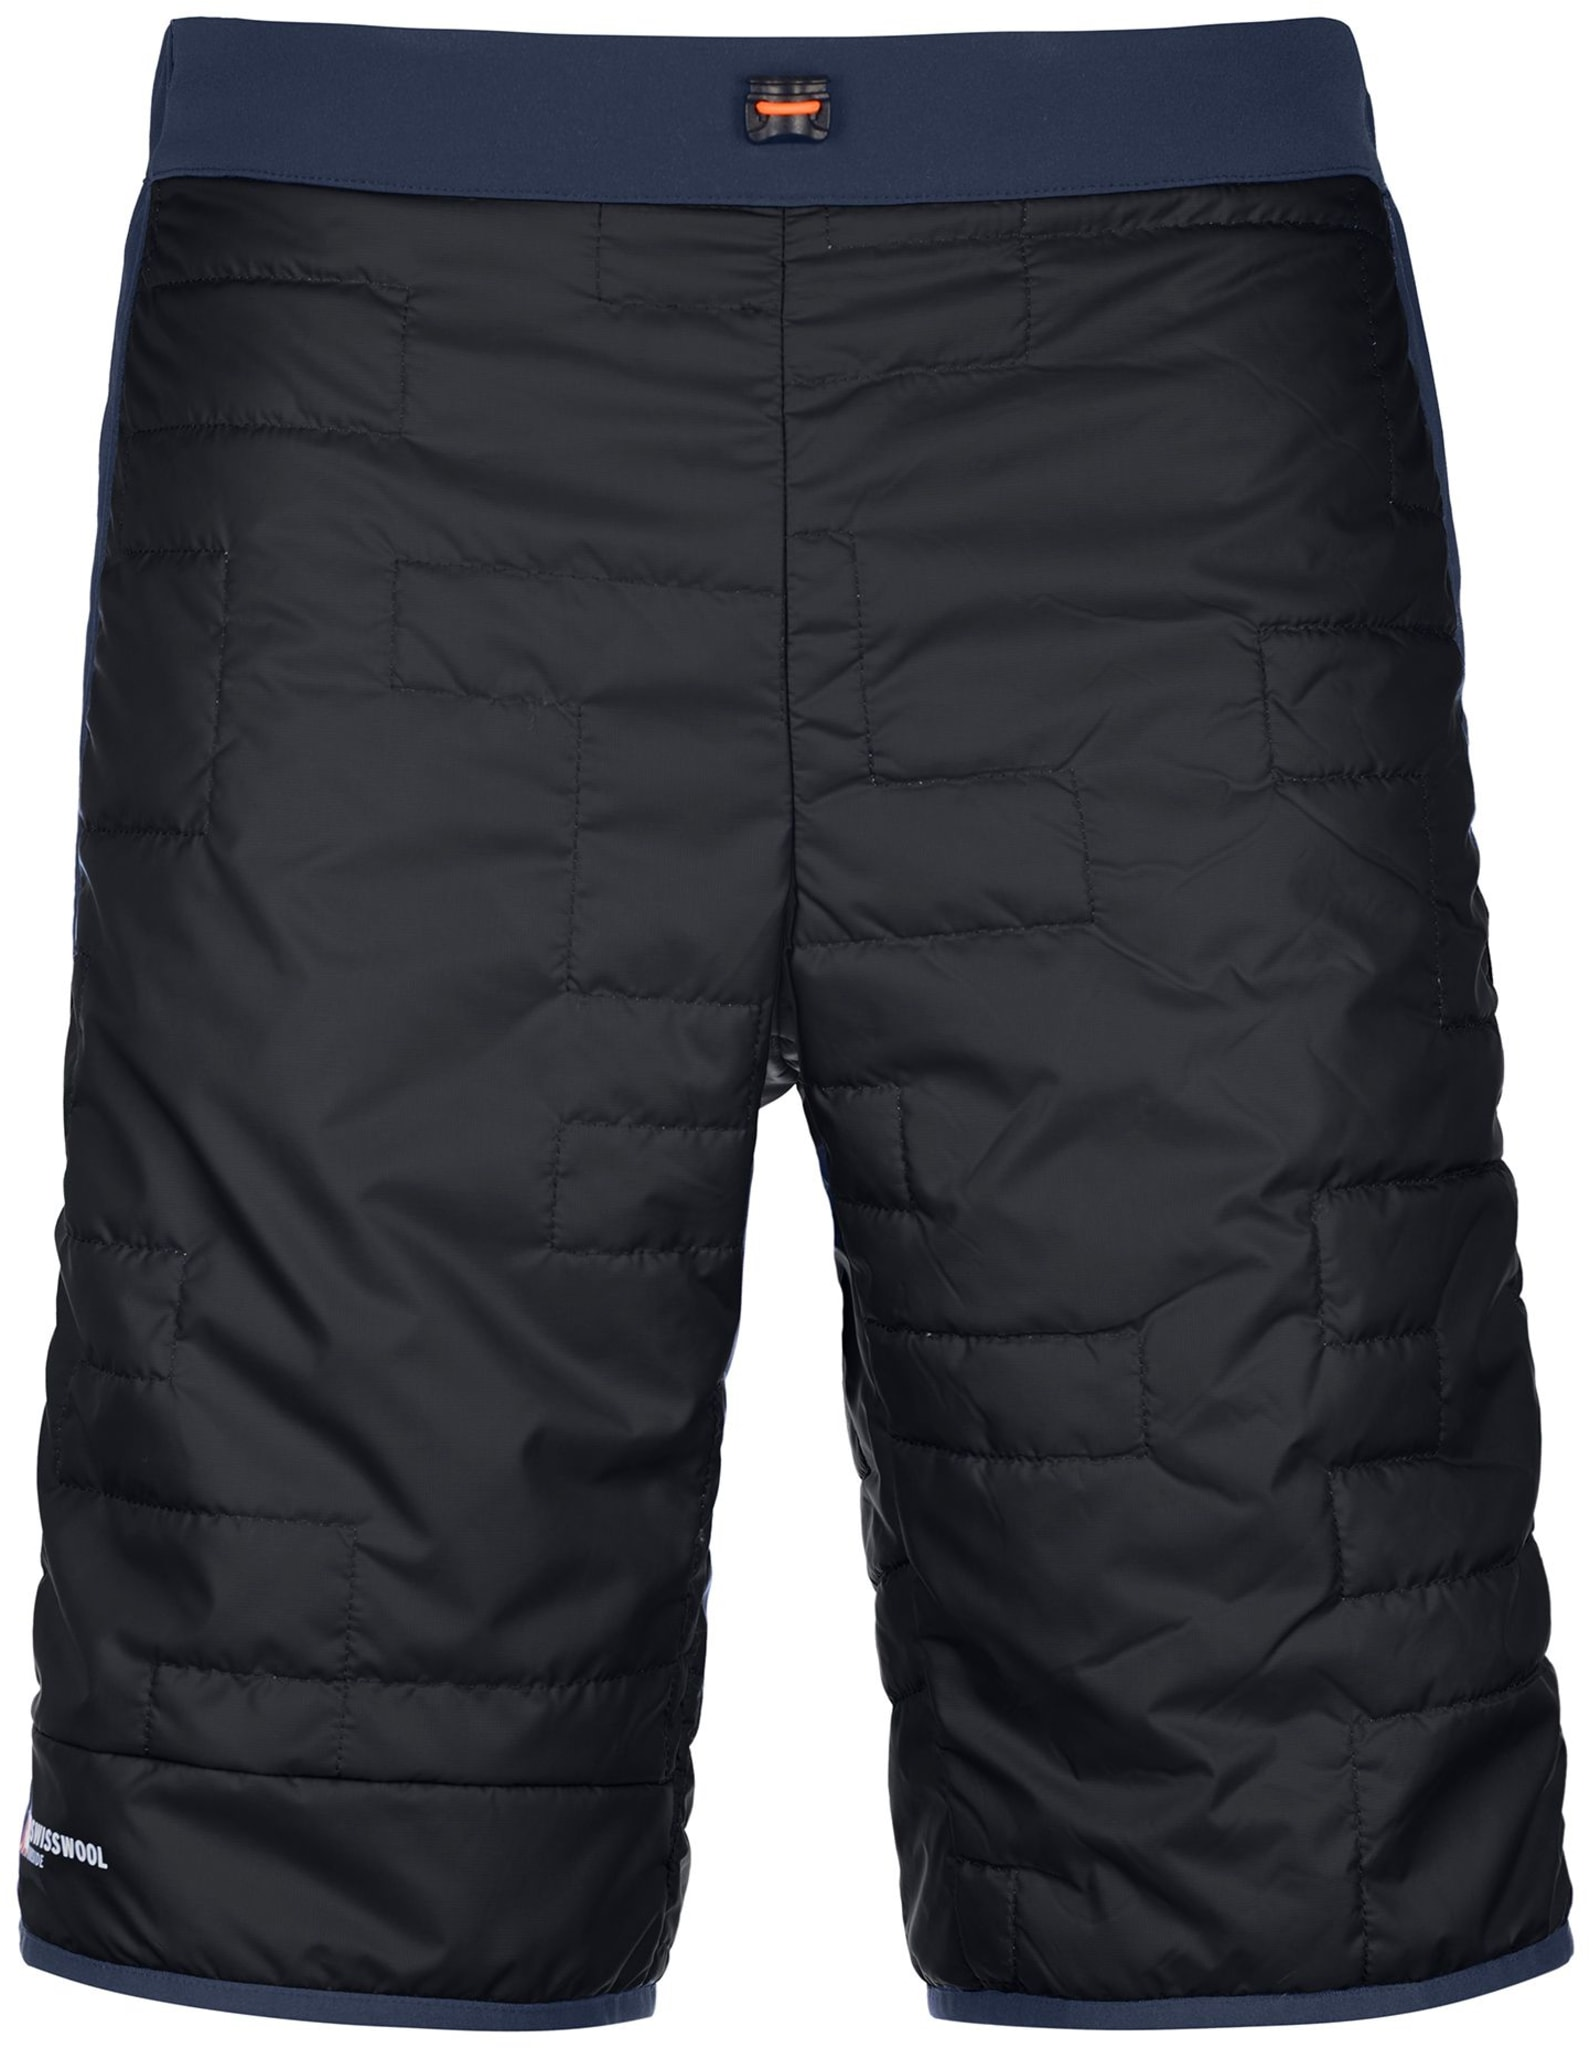 Swisswool Piz Boè Shorts M